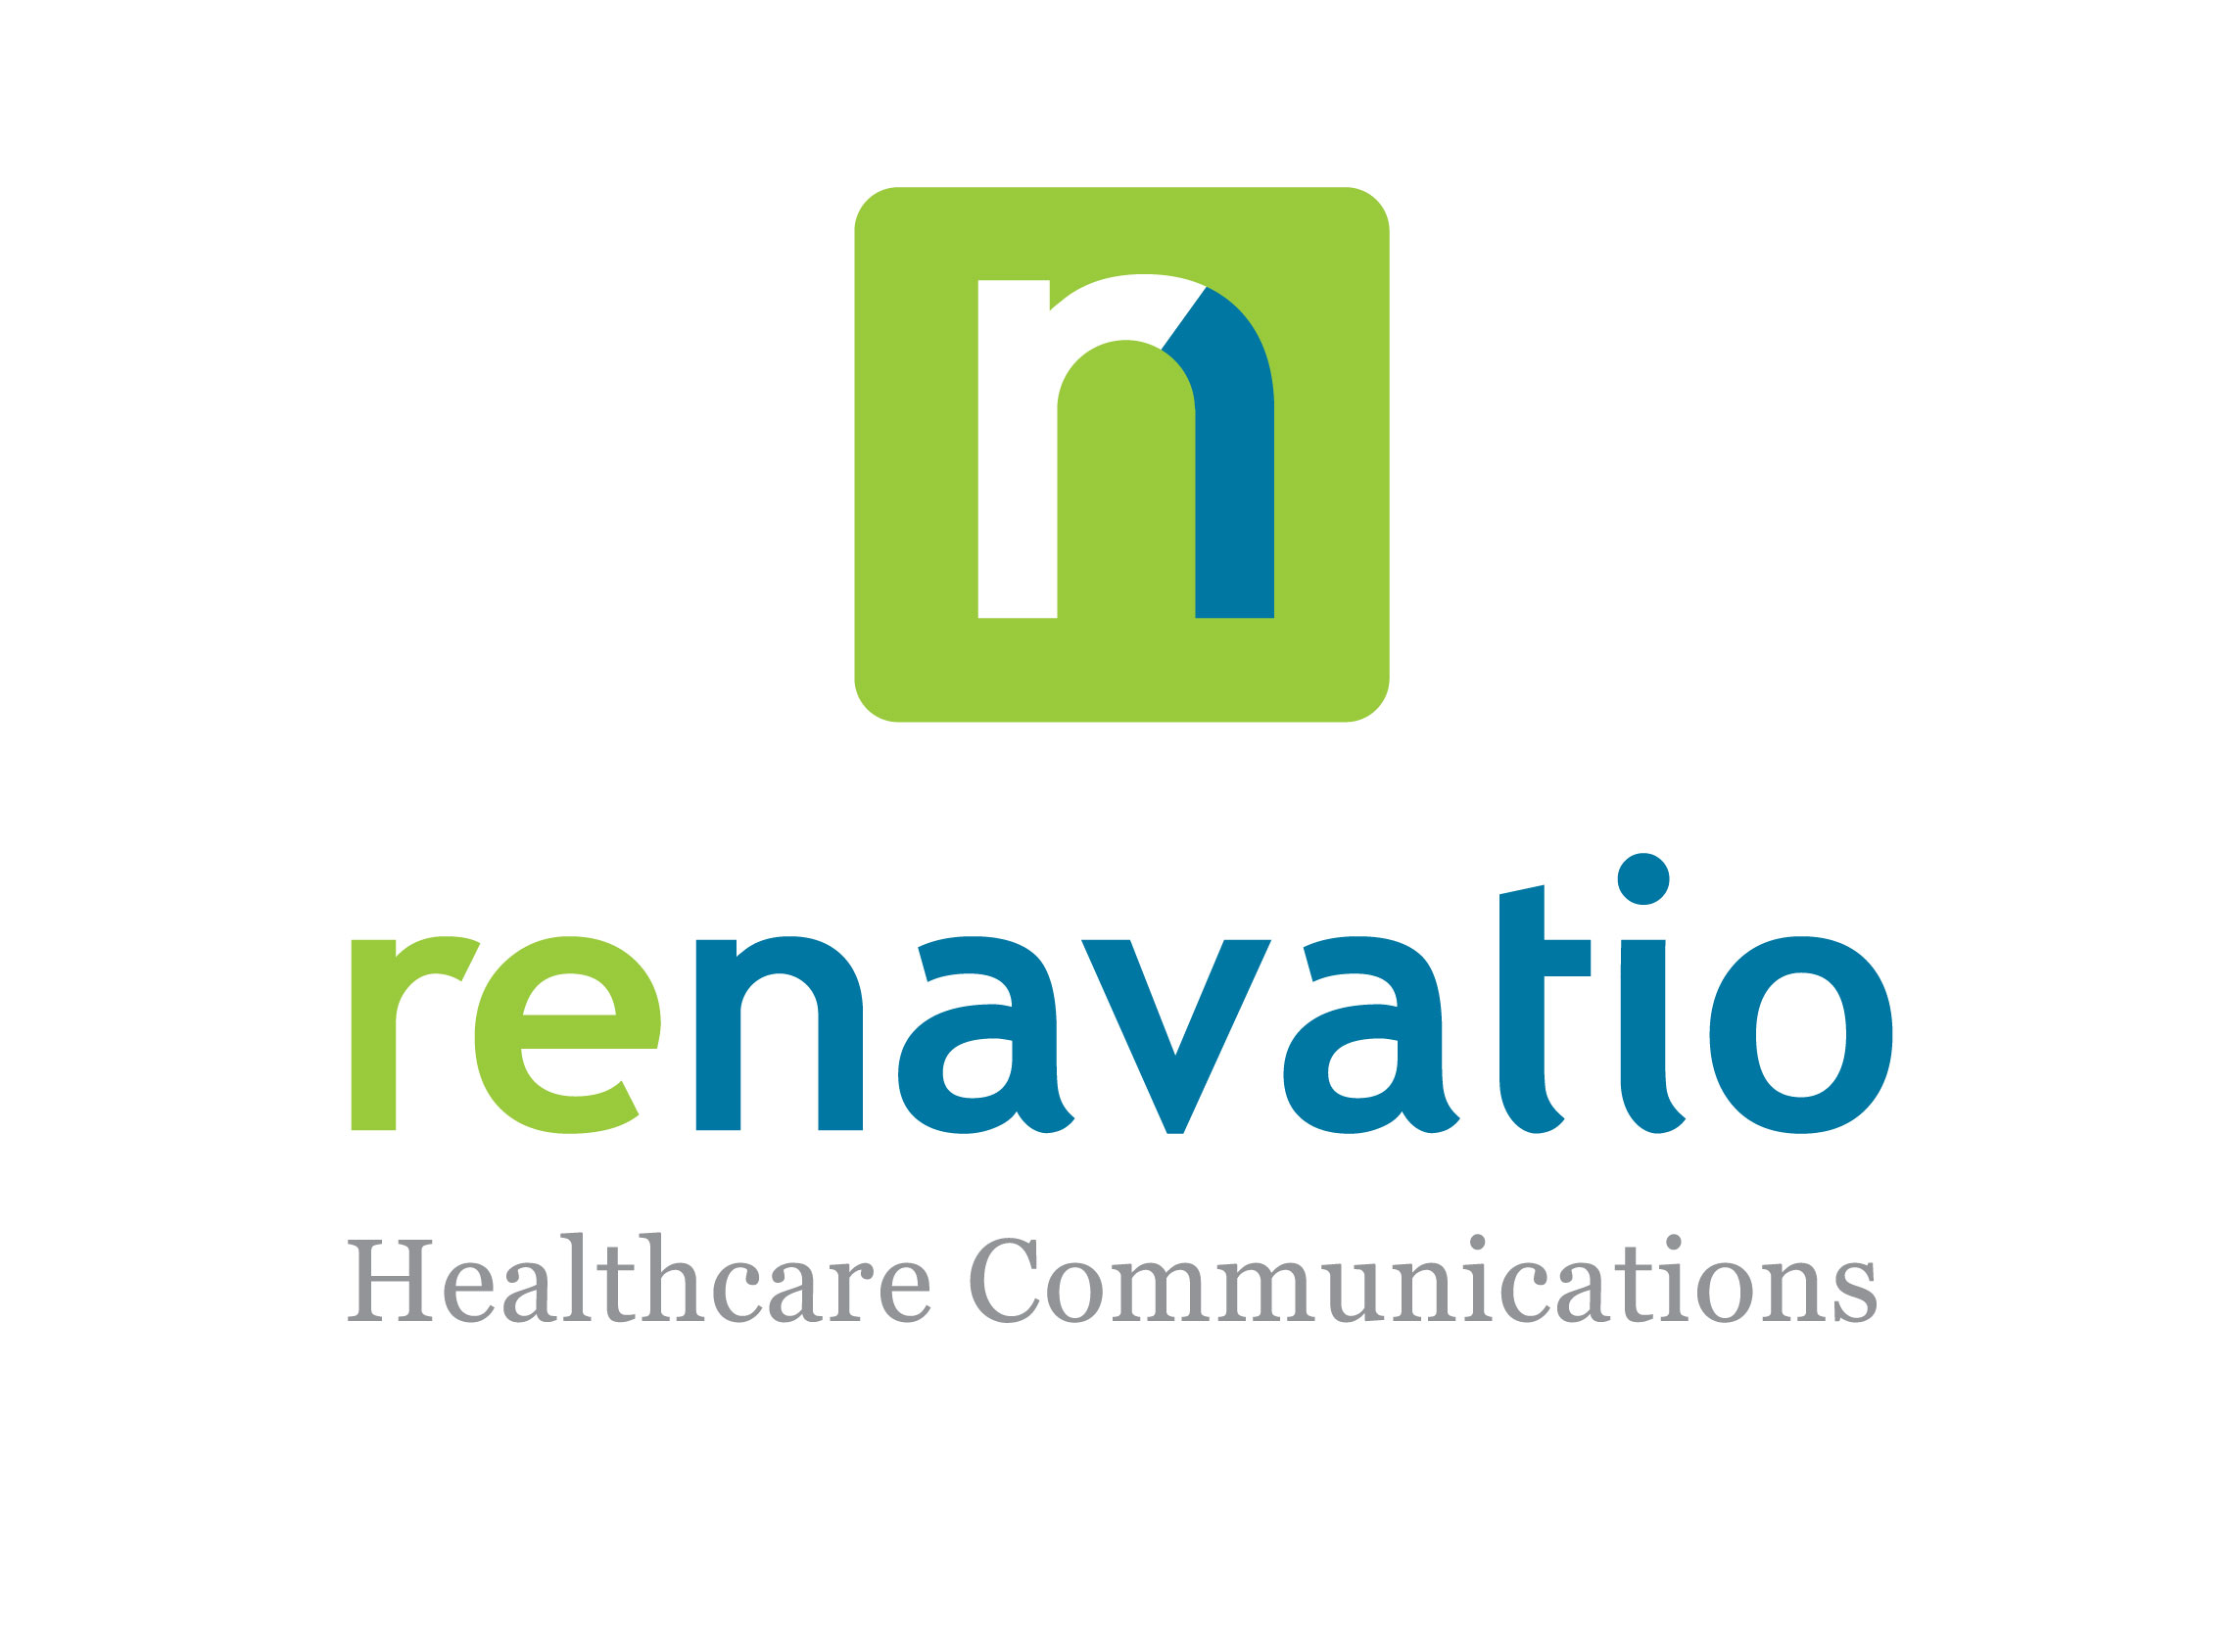 Renavatio Healthcare Communications